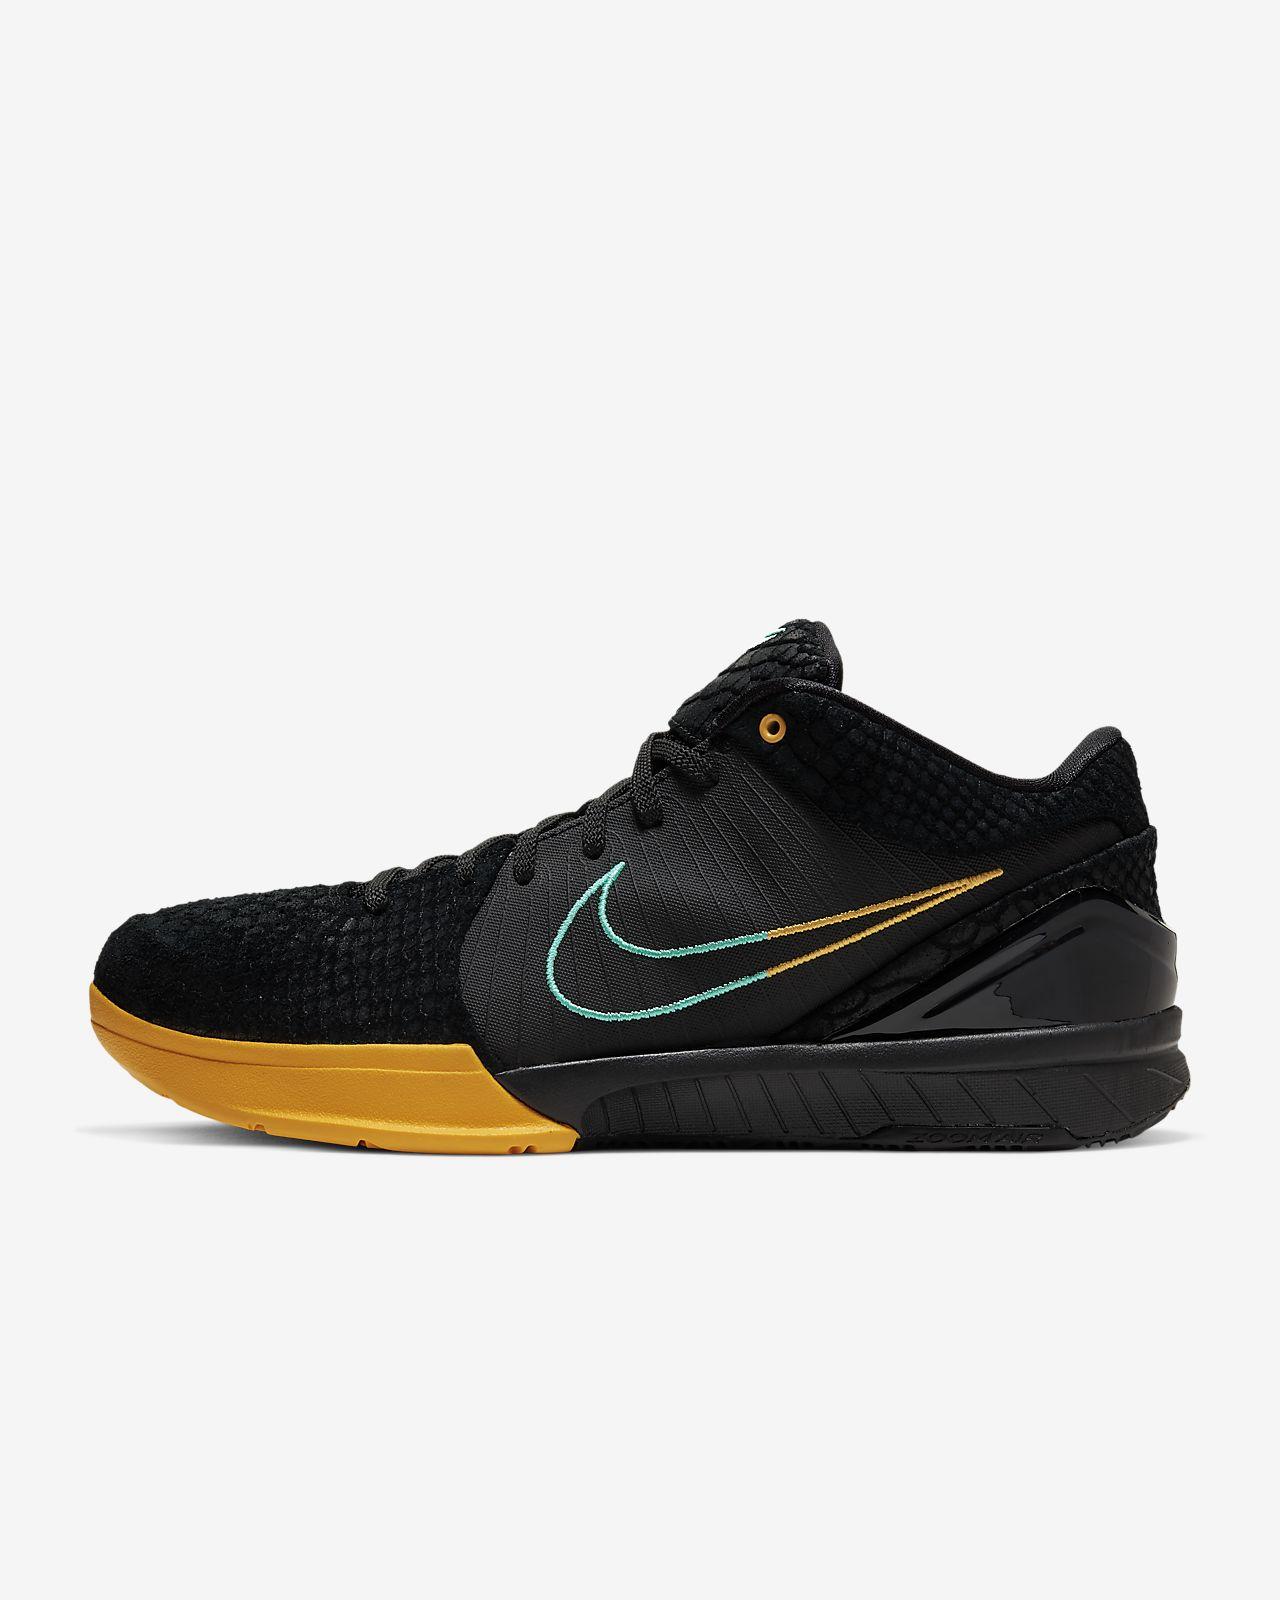 Chaussure de basketball Kobe IV Protro